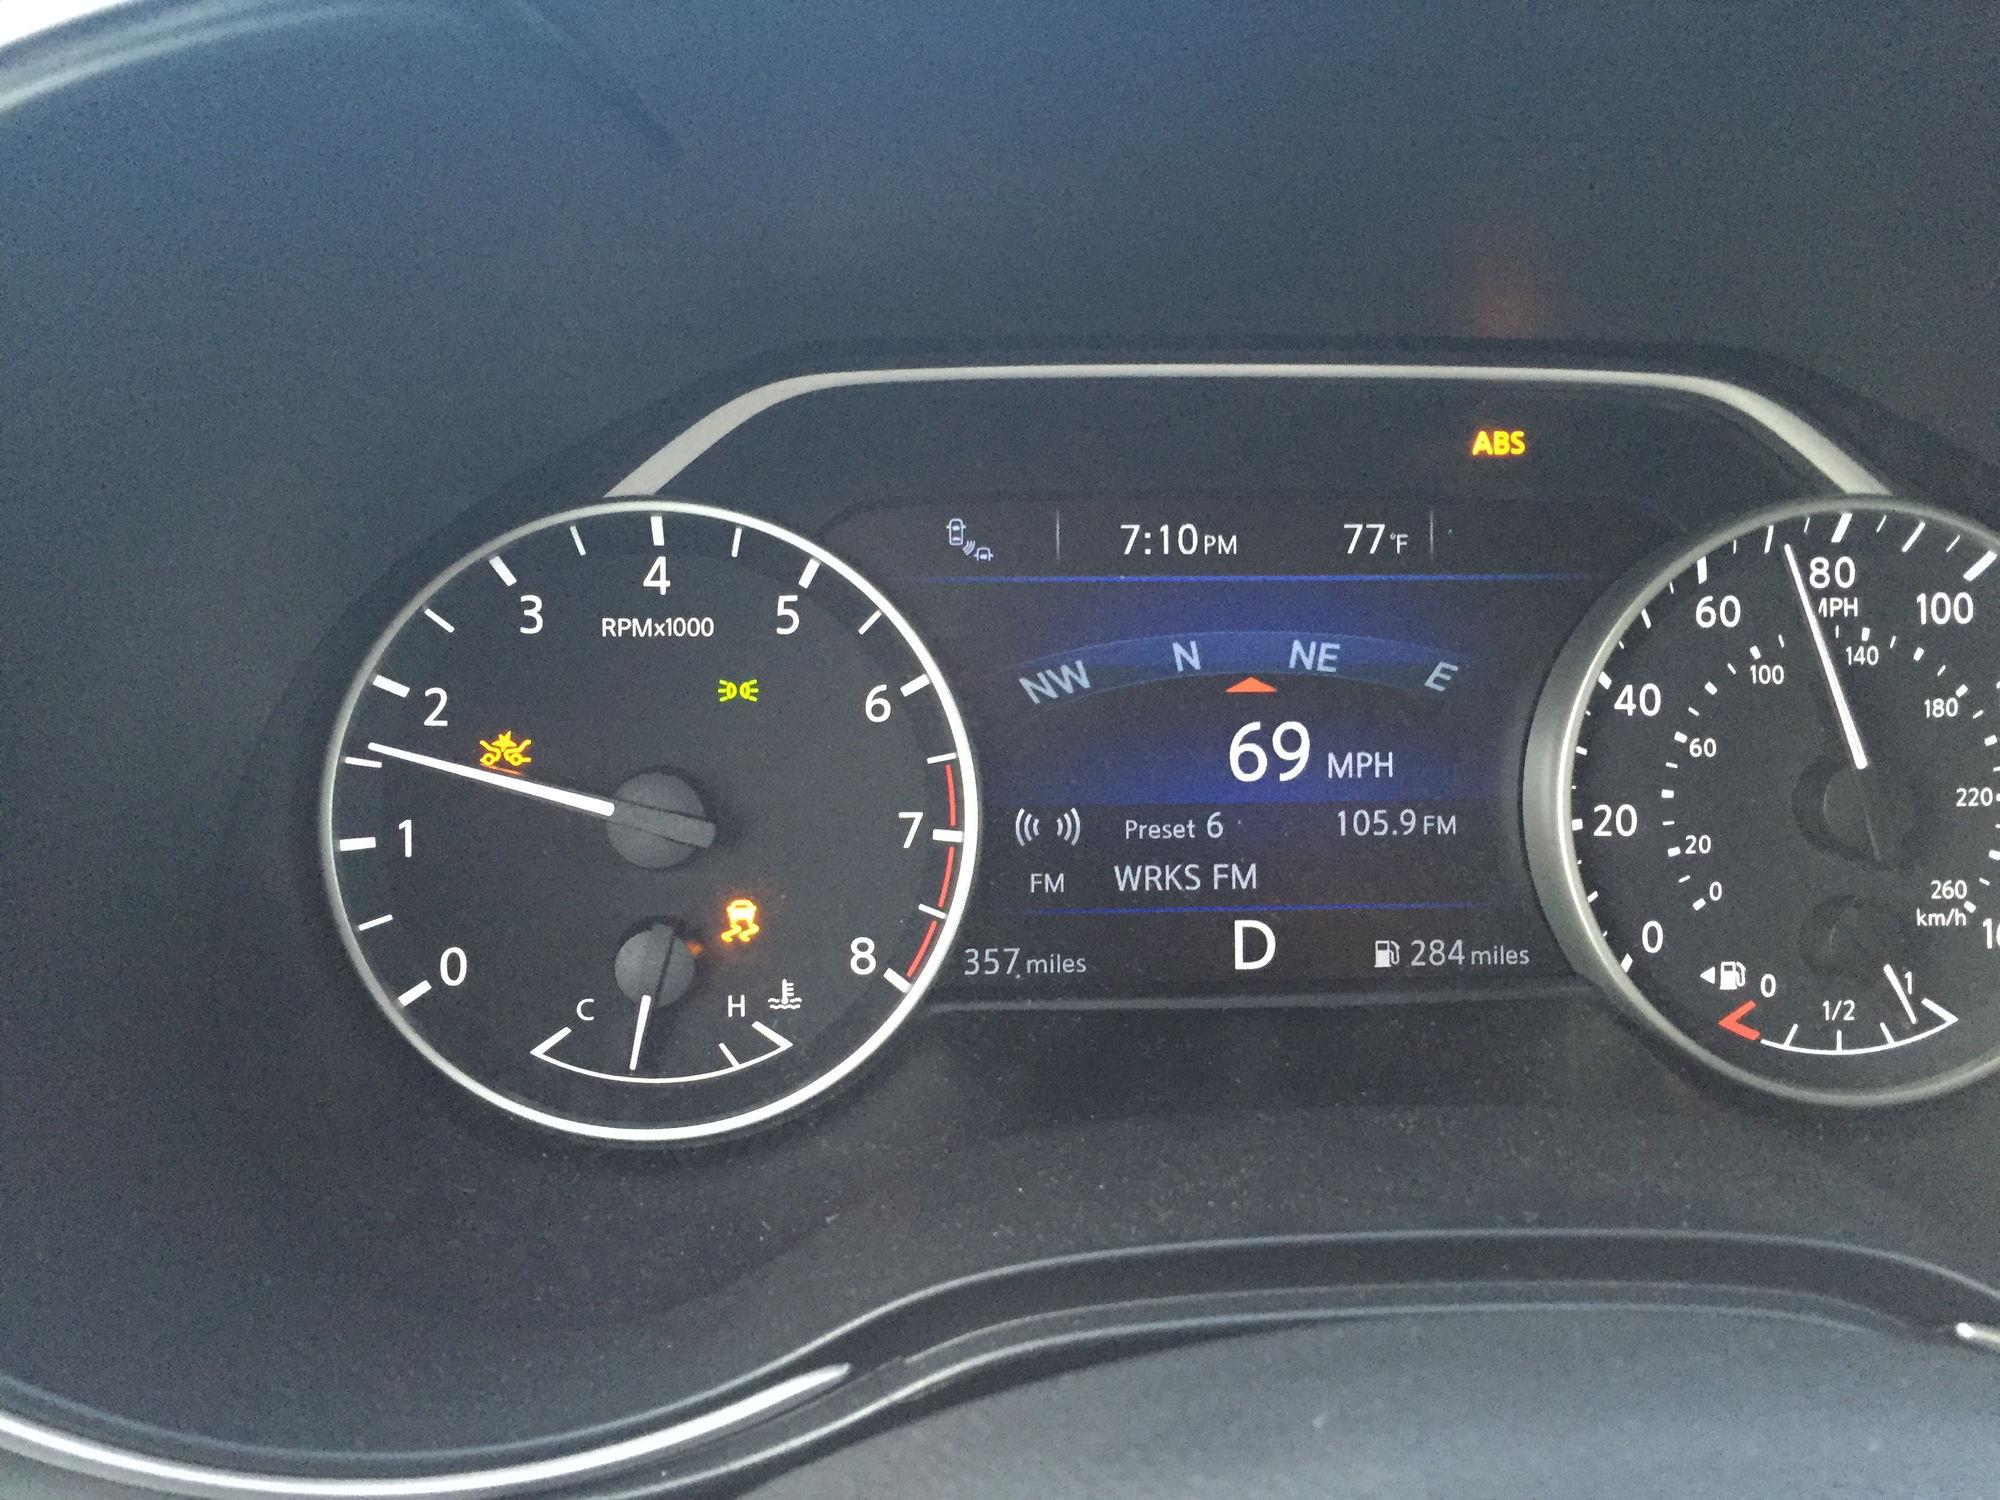 Nissan Maxima: Indicator lights